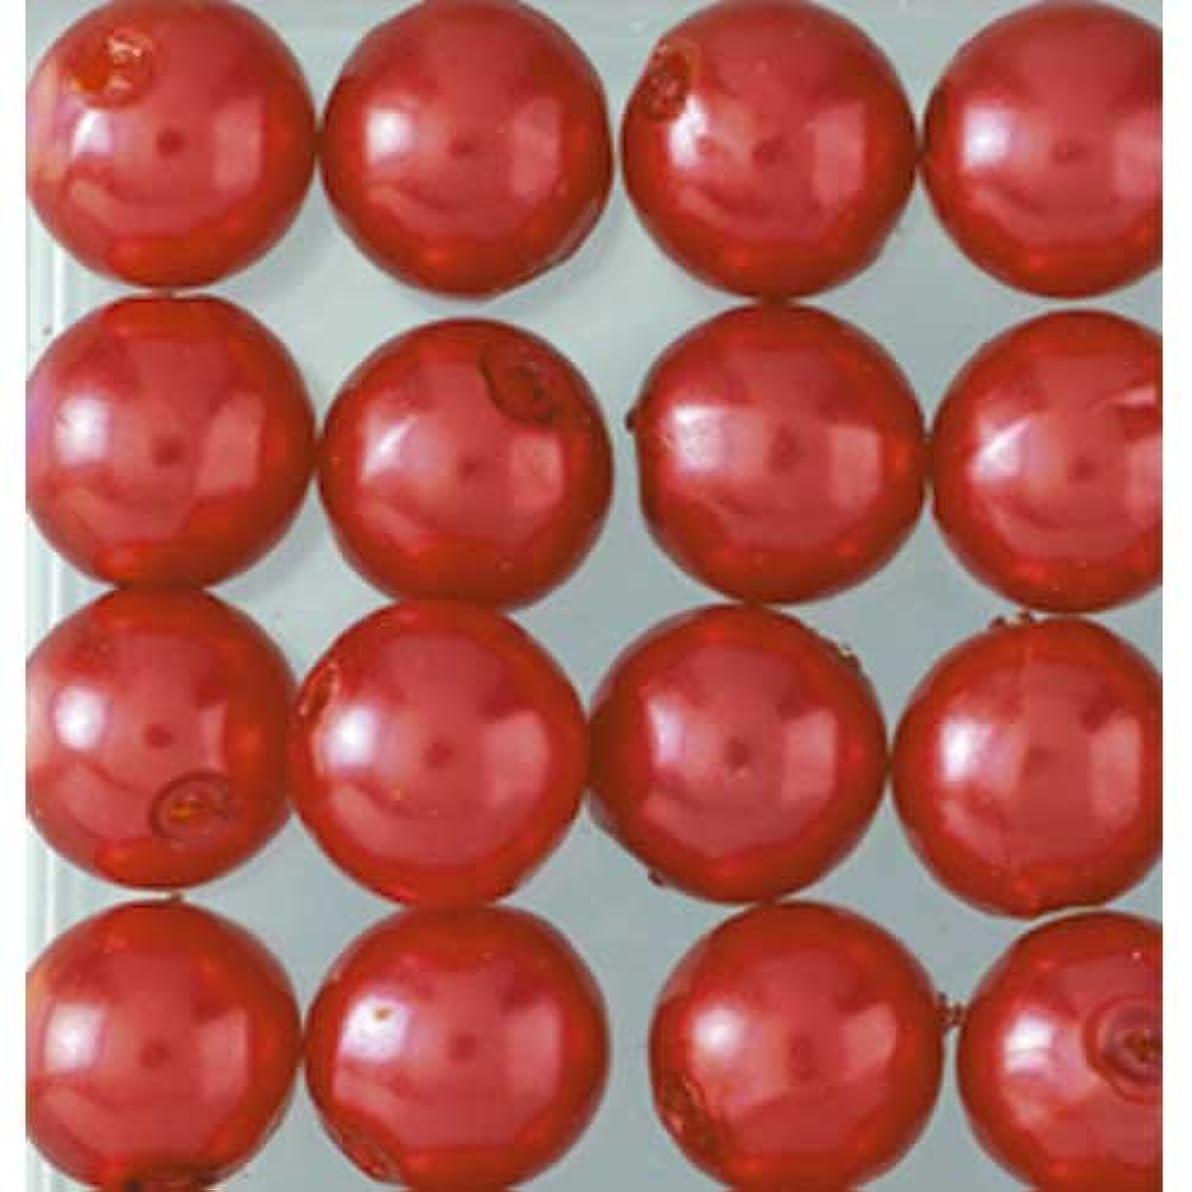 Efco Wax Beads, Plastic, Red, 4 mm Diameter, 125-Piece